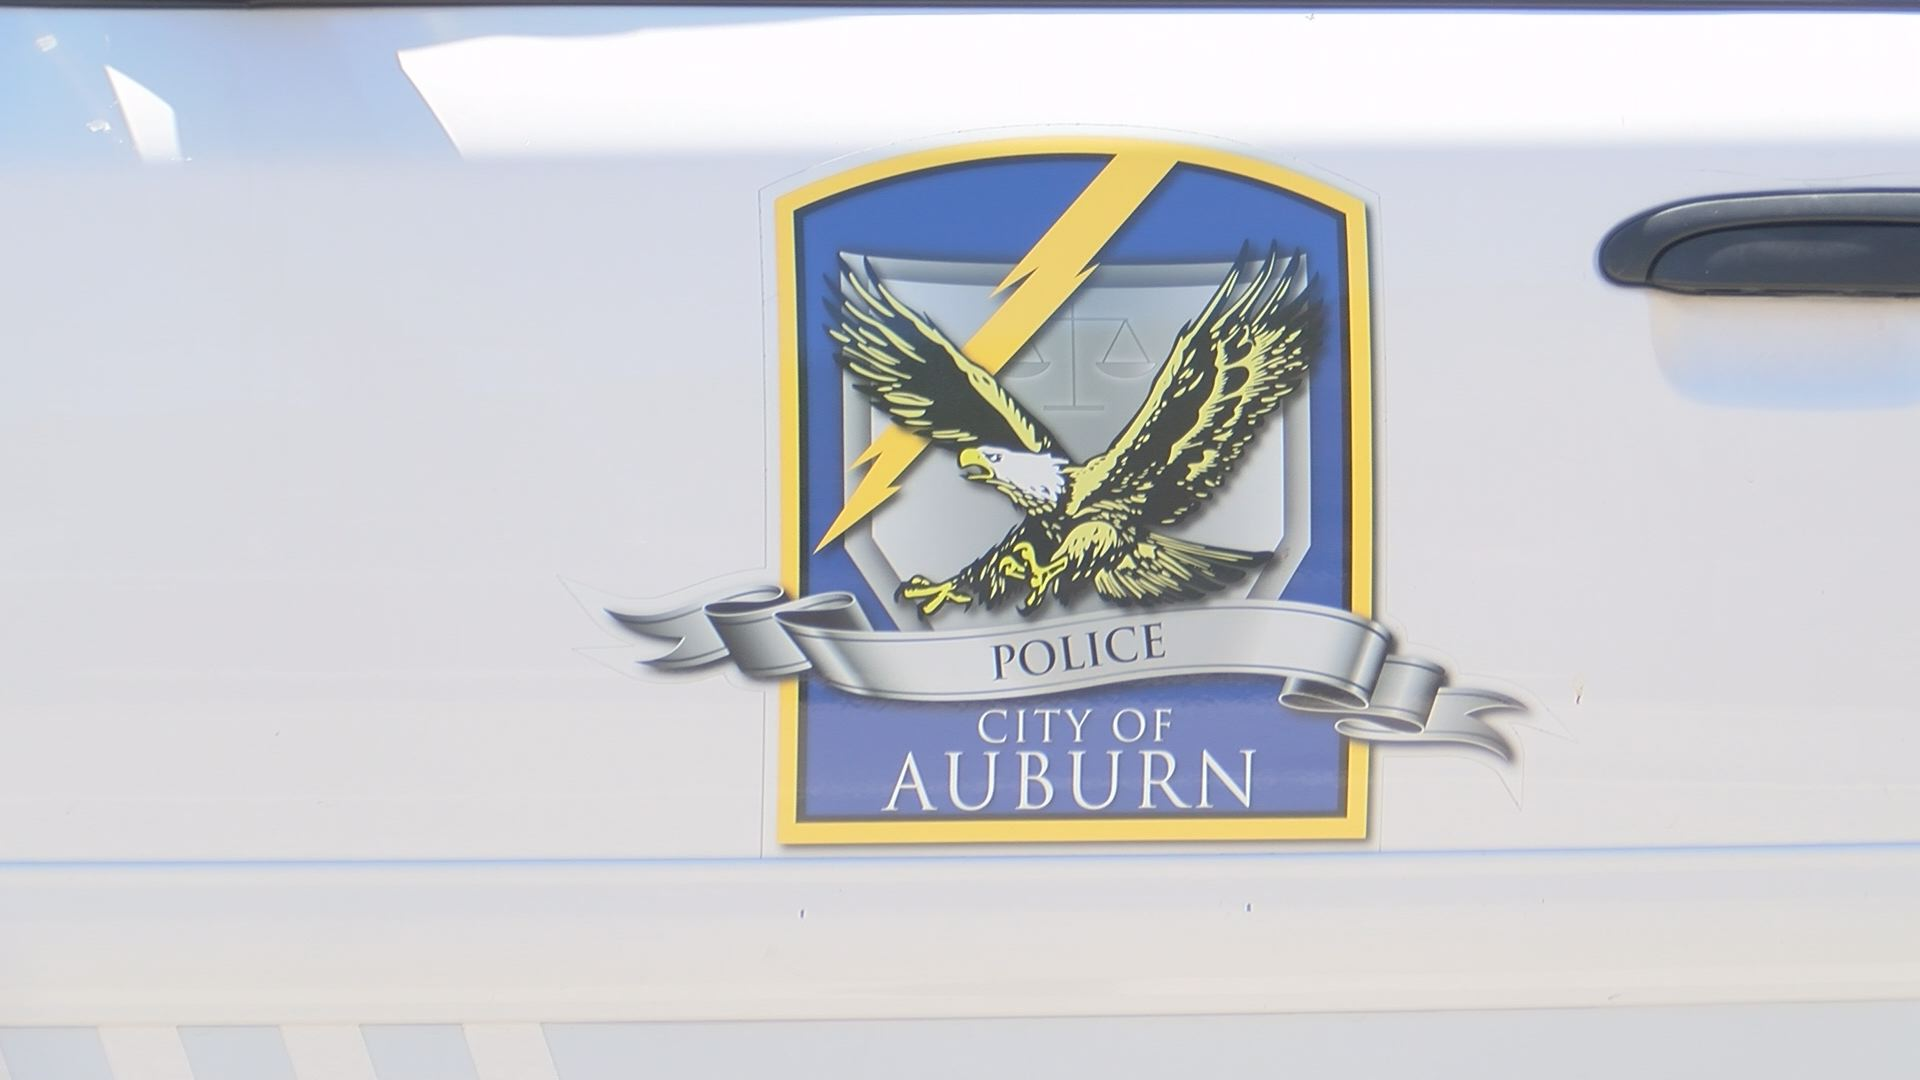 auburnpolice_177177